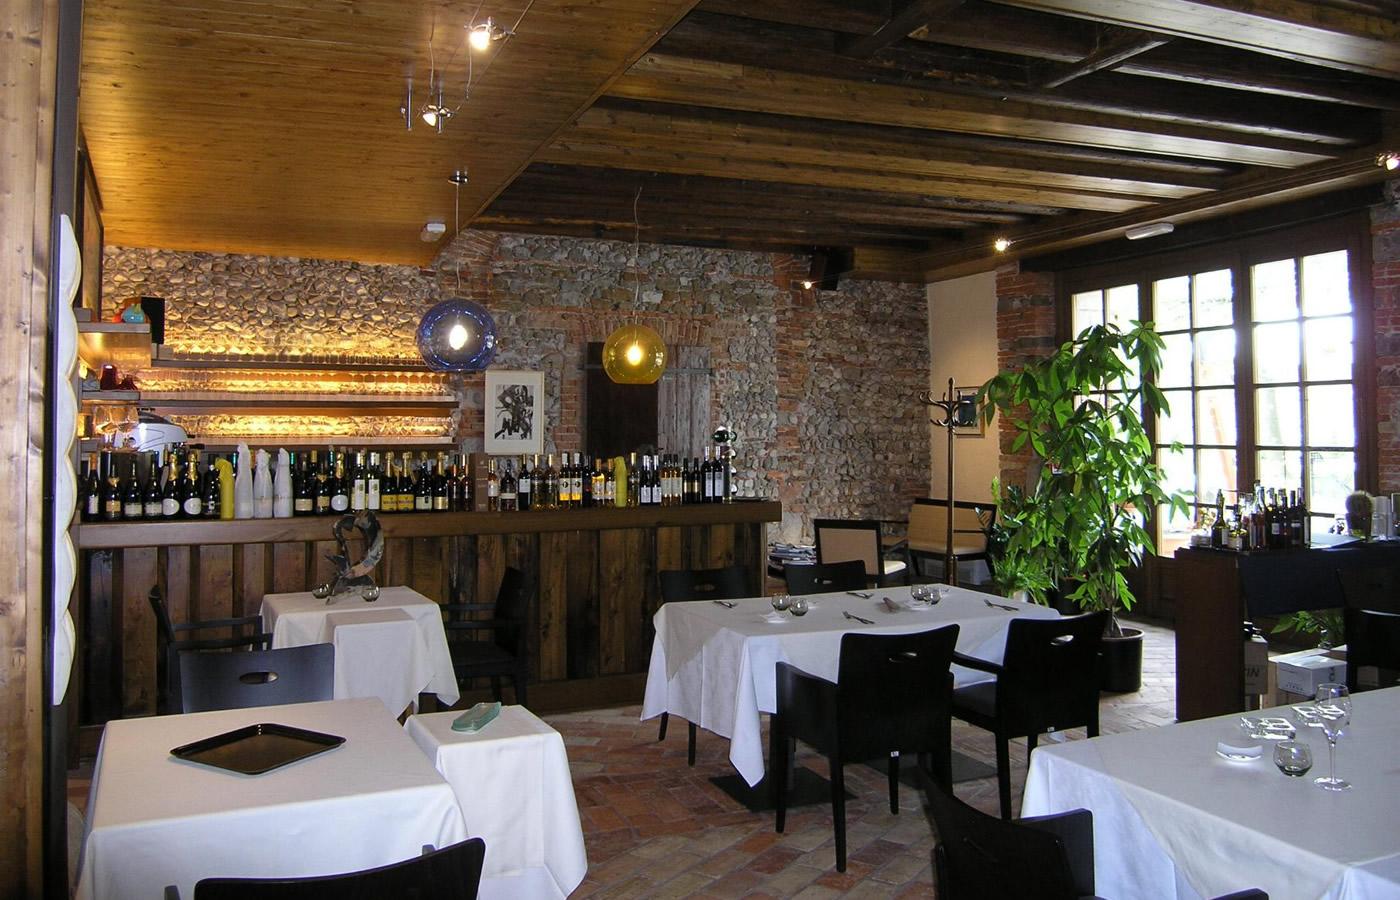 arredamento ristorante rustico tf87 regardsdefemmes